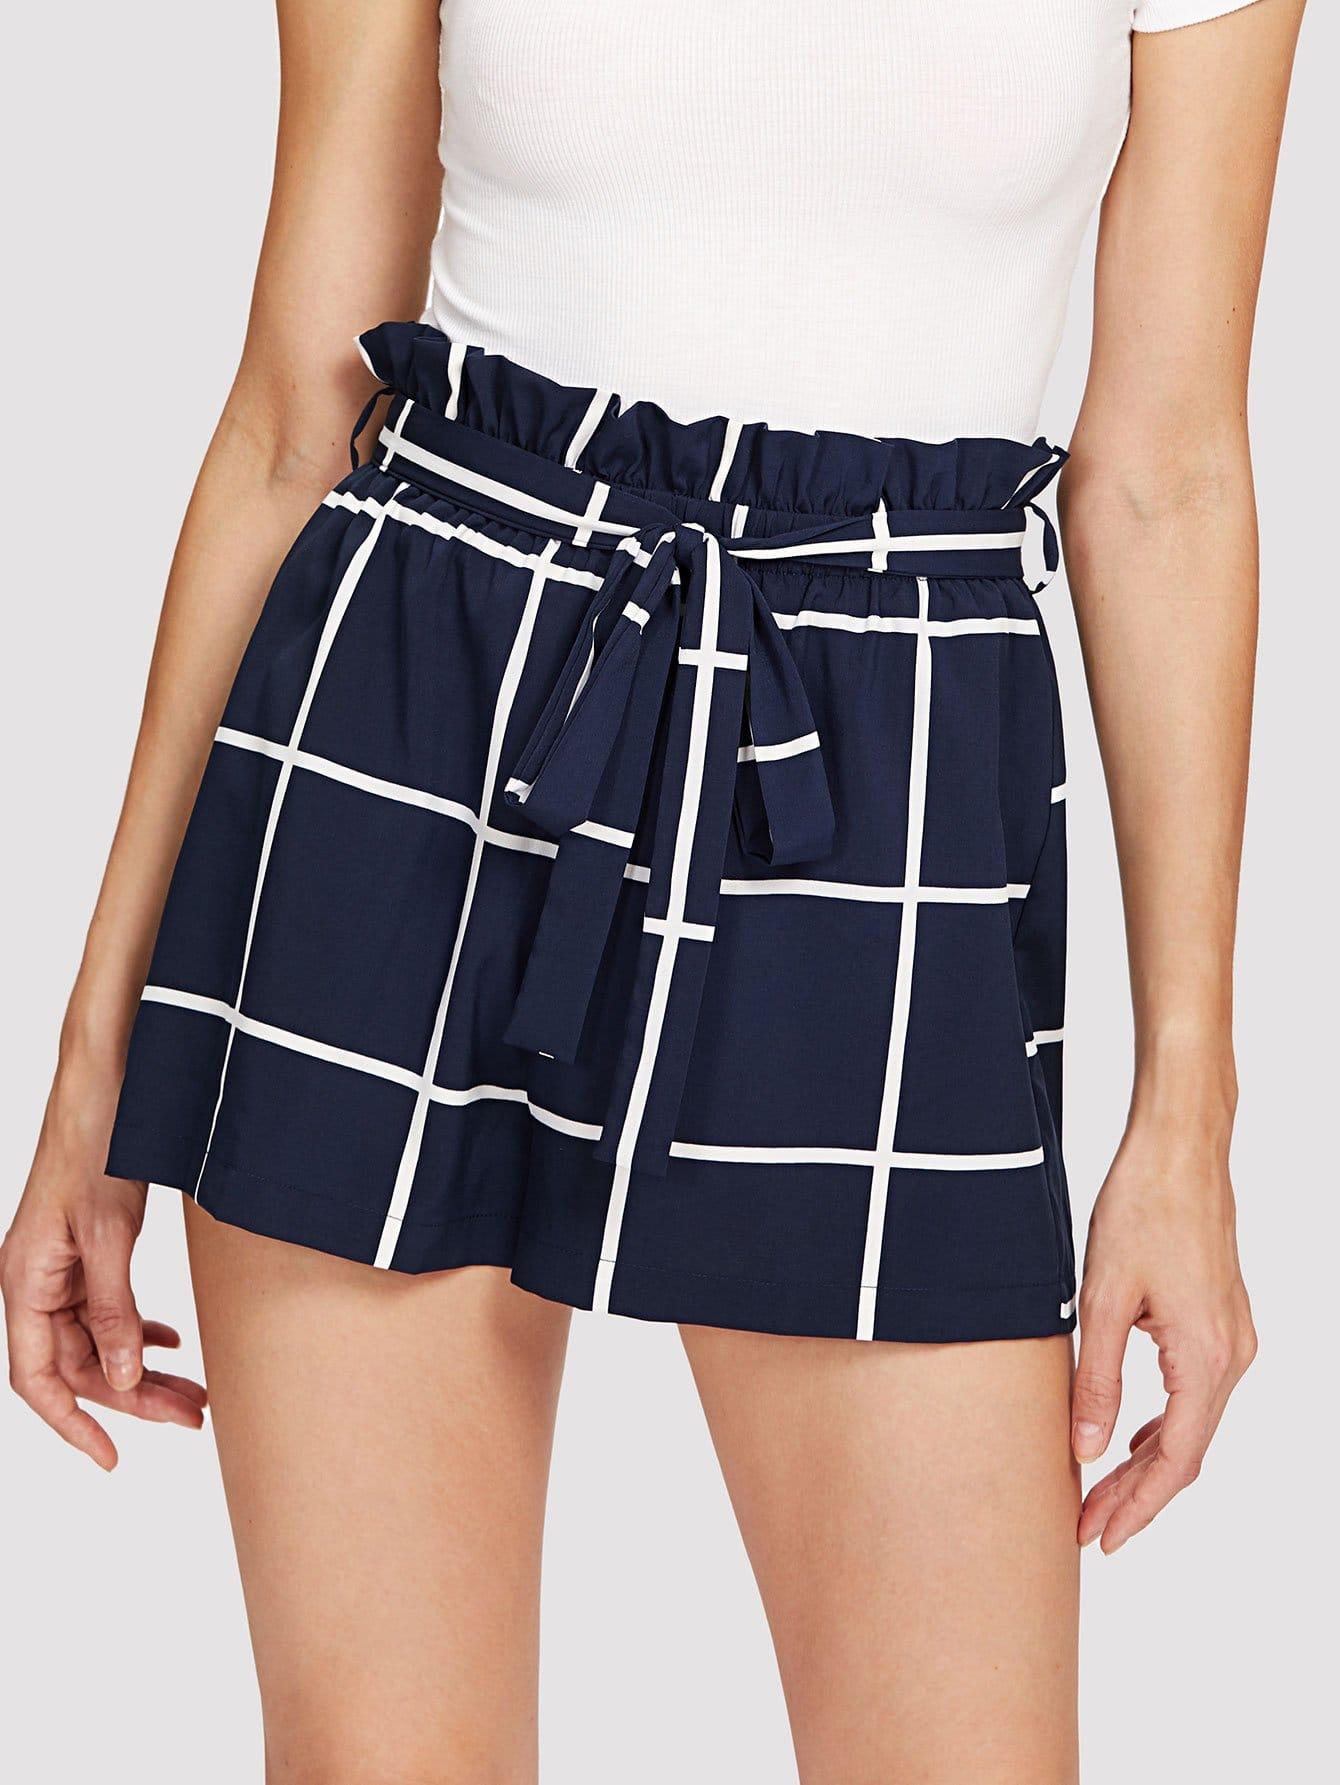 Ruffle Waist Self Belt Grid Shorts ruffle waist self belt grid shorts